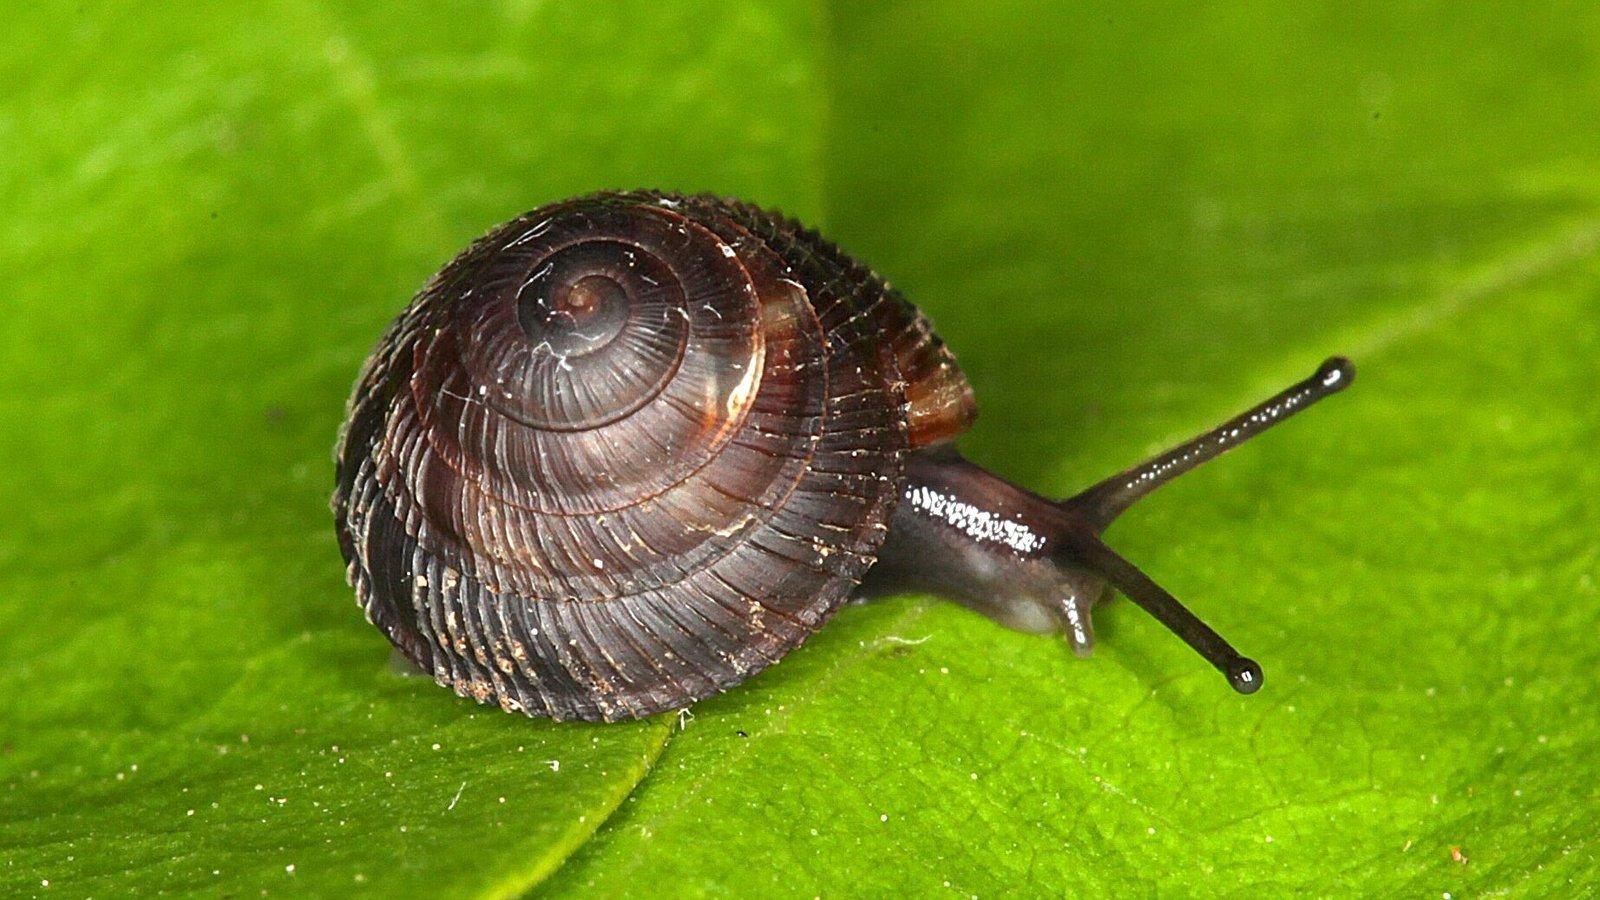 Fanulena insculpta, one of Norfolk Island's endemic snails.